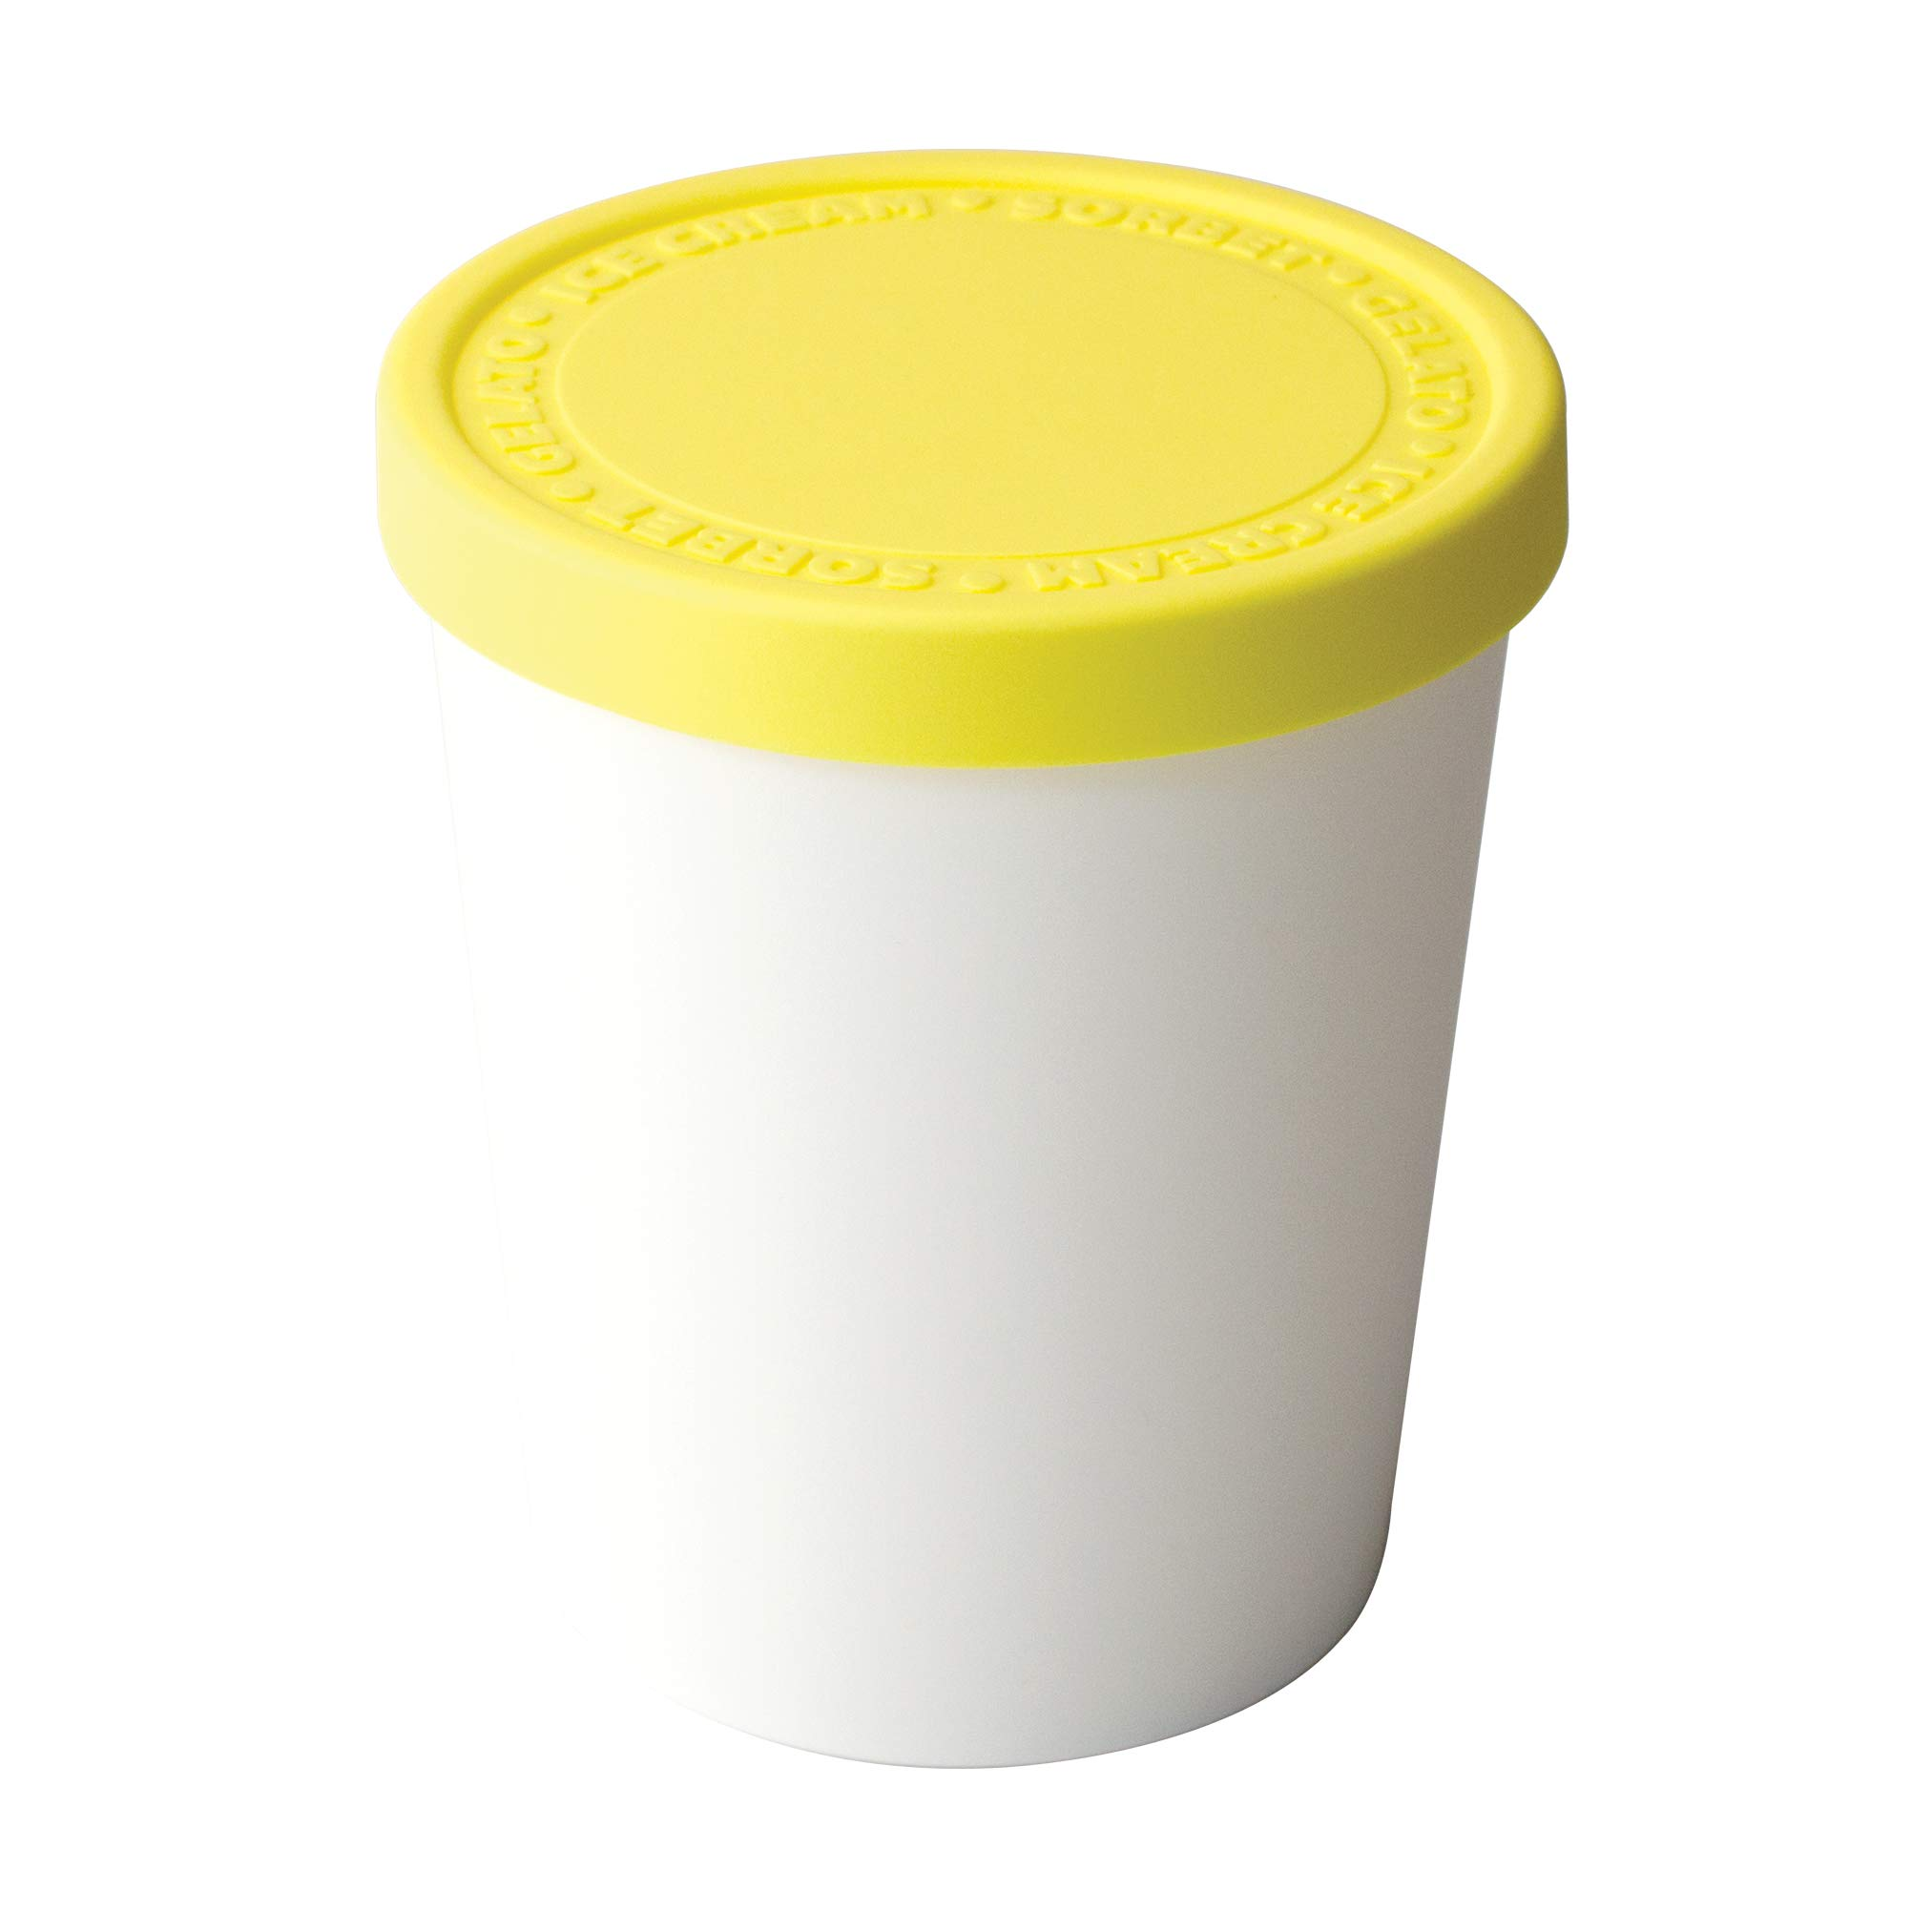 Tovolo Tight-Fitting, Stack-Friendly, Sweet Treat Ice Cream Tub - Lemon